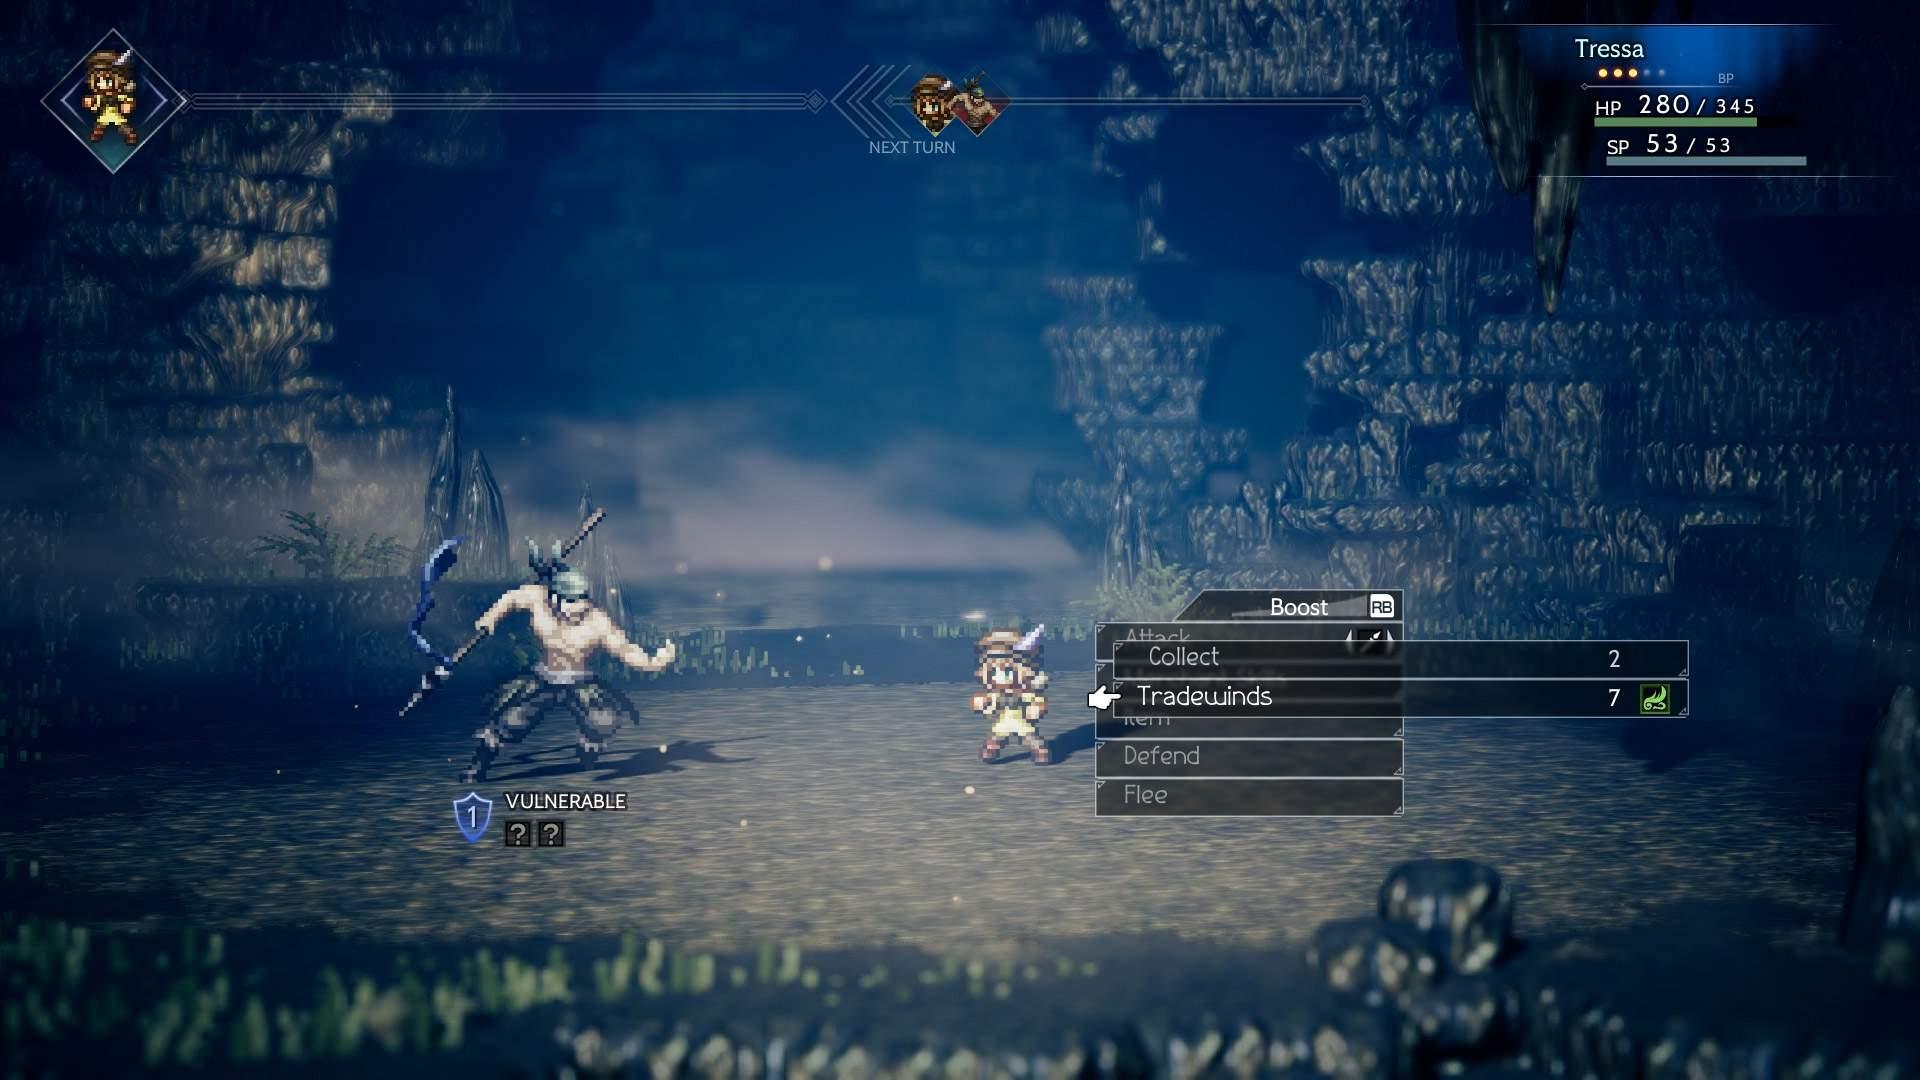 In game battle screenshot in a dark dungeon, showing Tressa in turn based battle against an enemy.